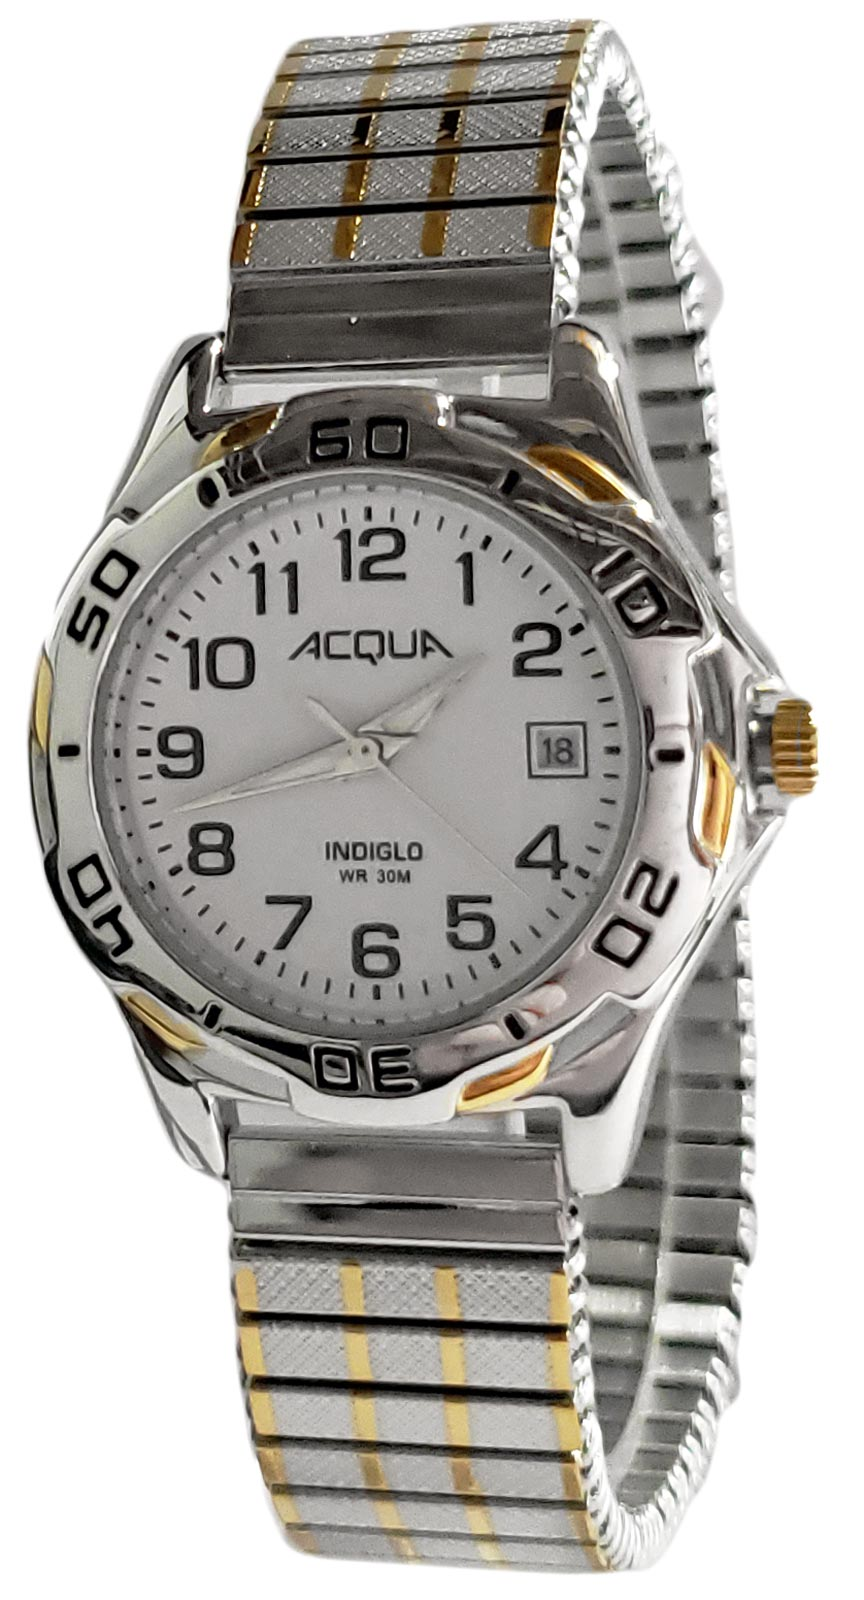 timex acqua indiglo watch instructions